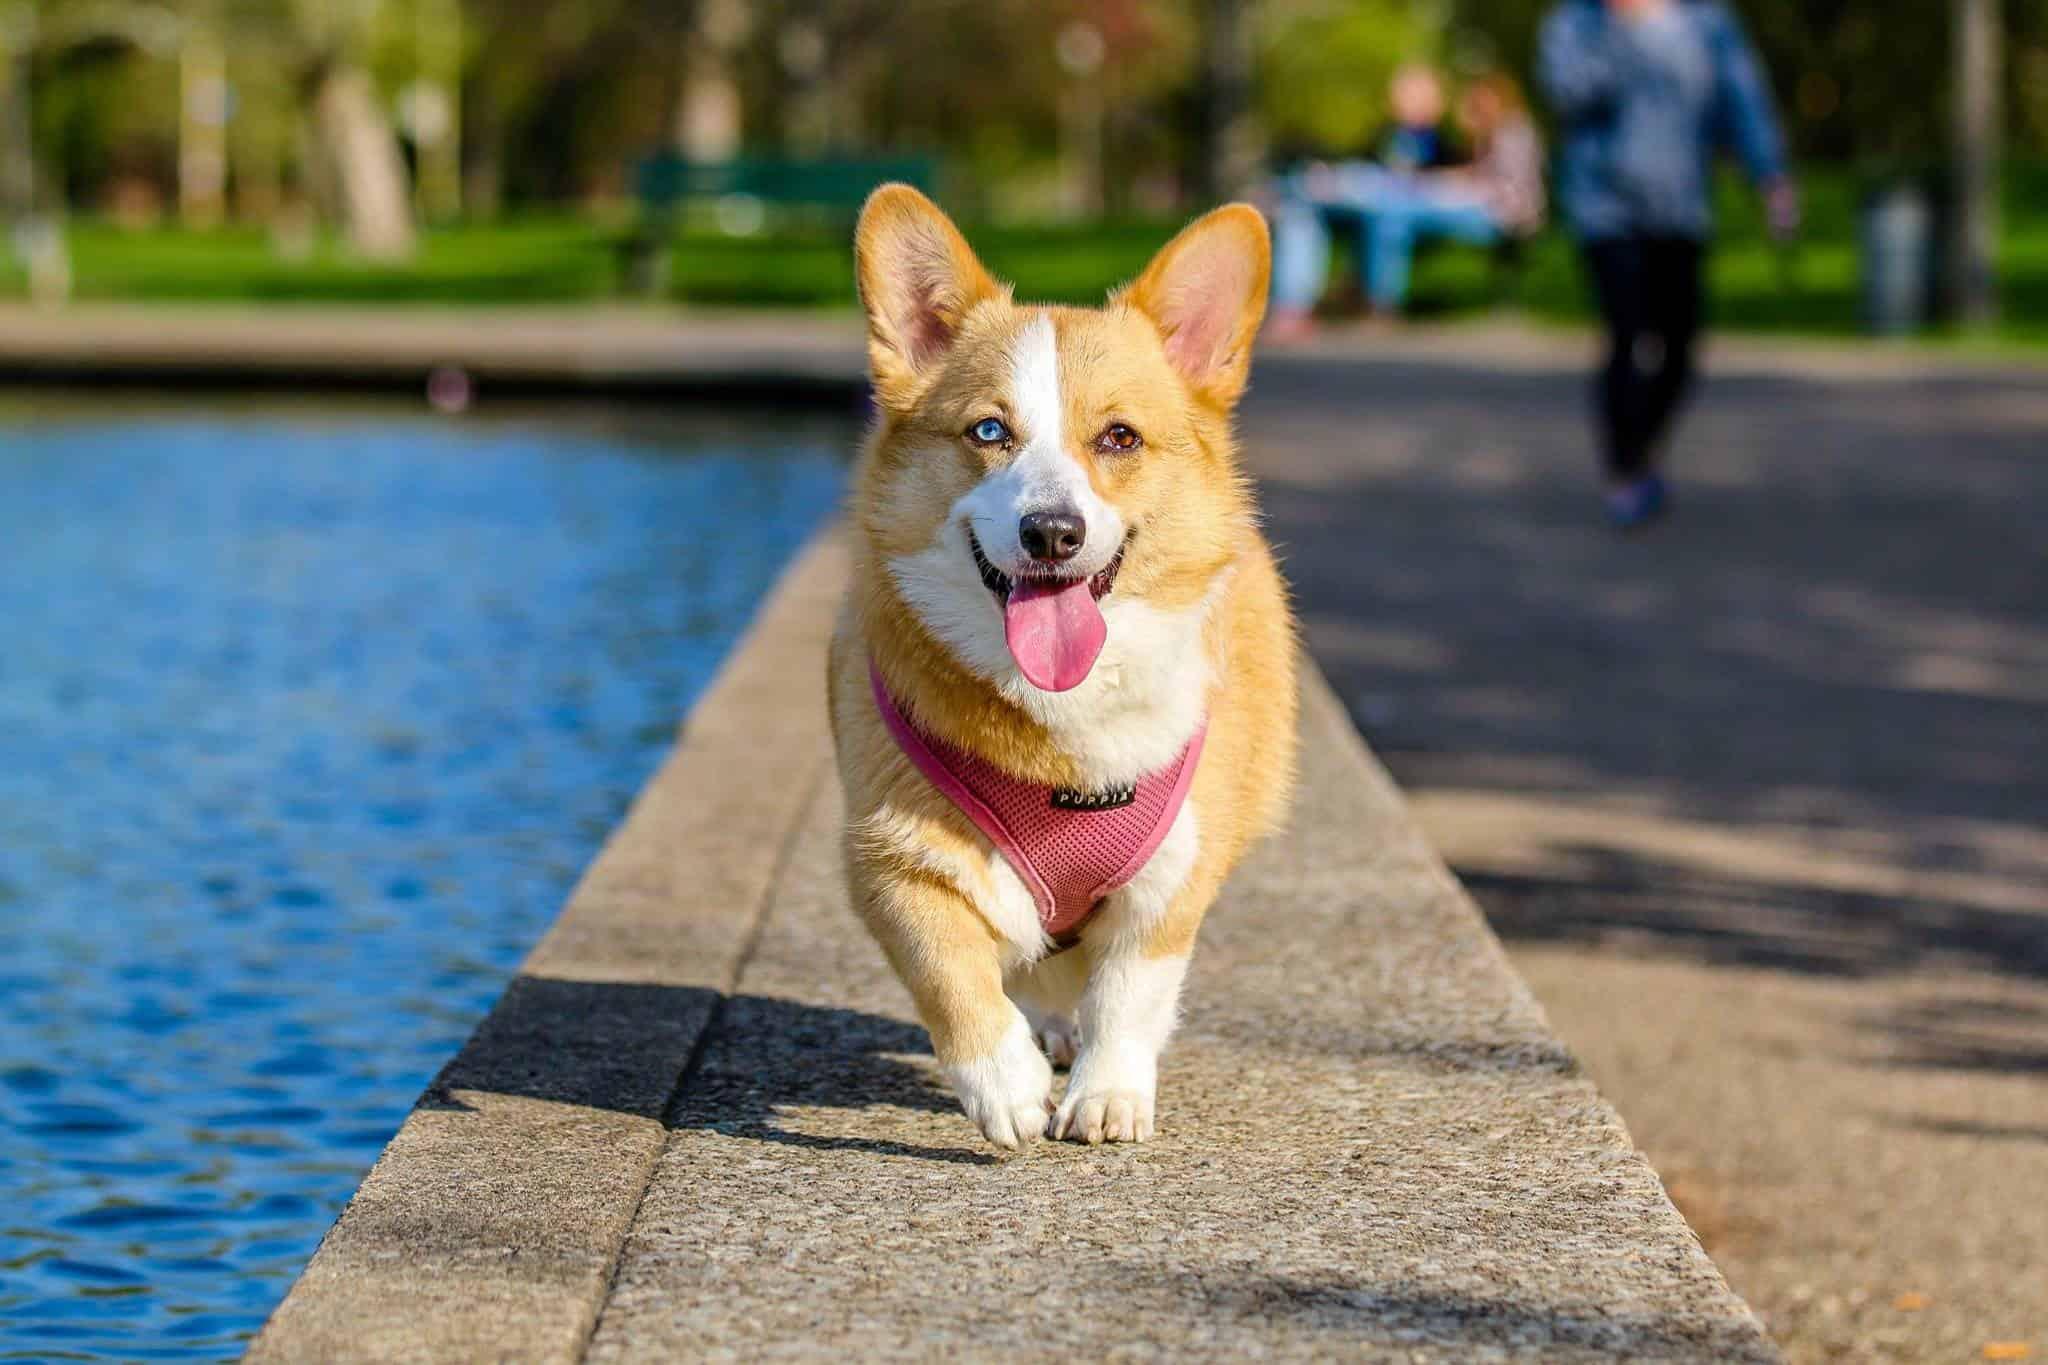 dog running while happily breathing